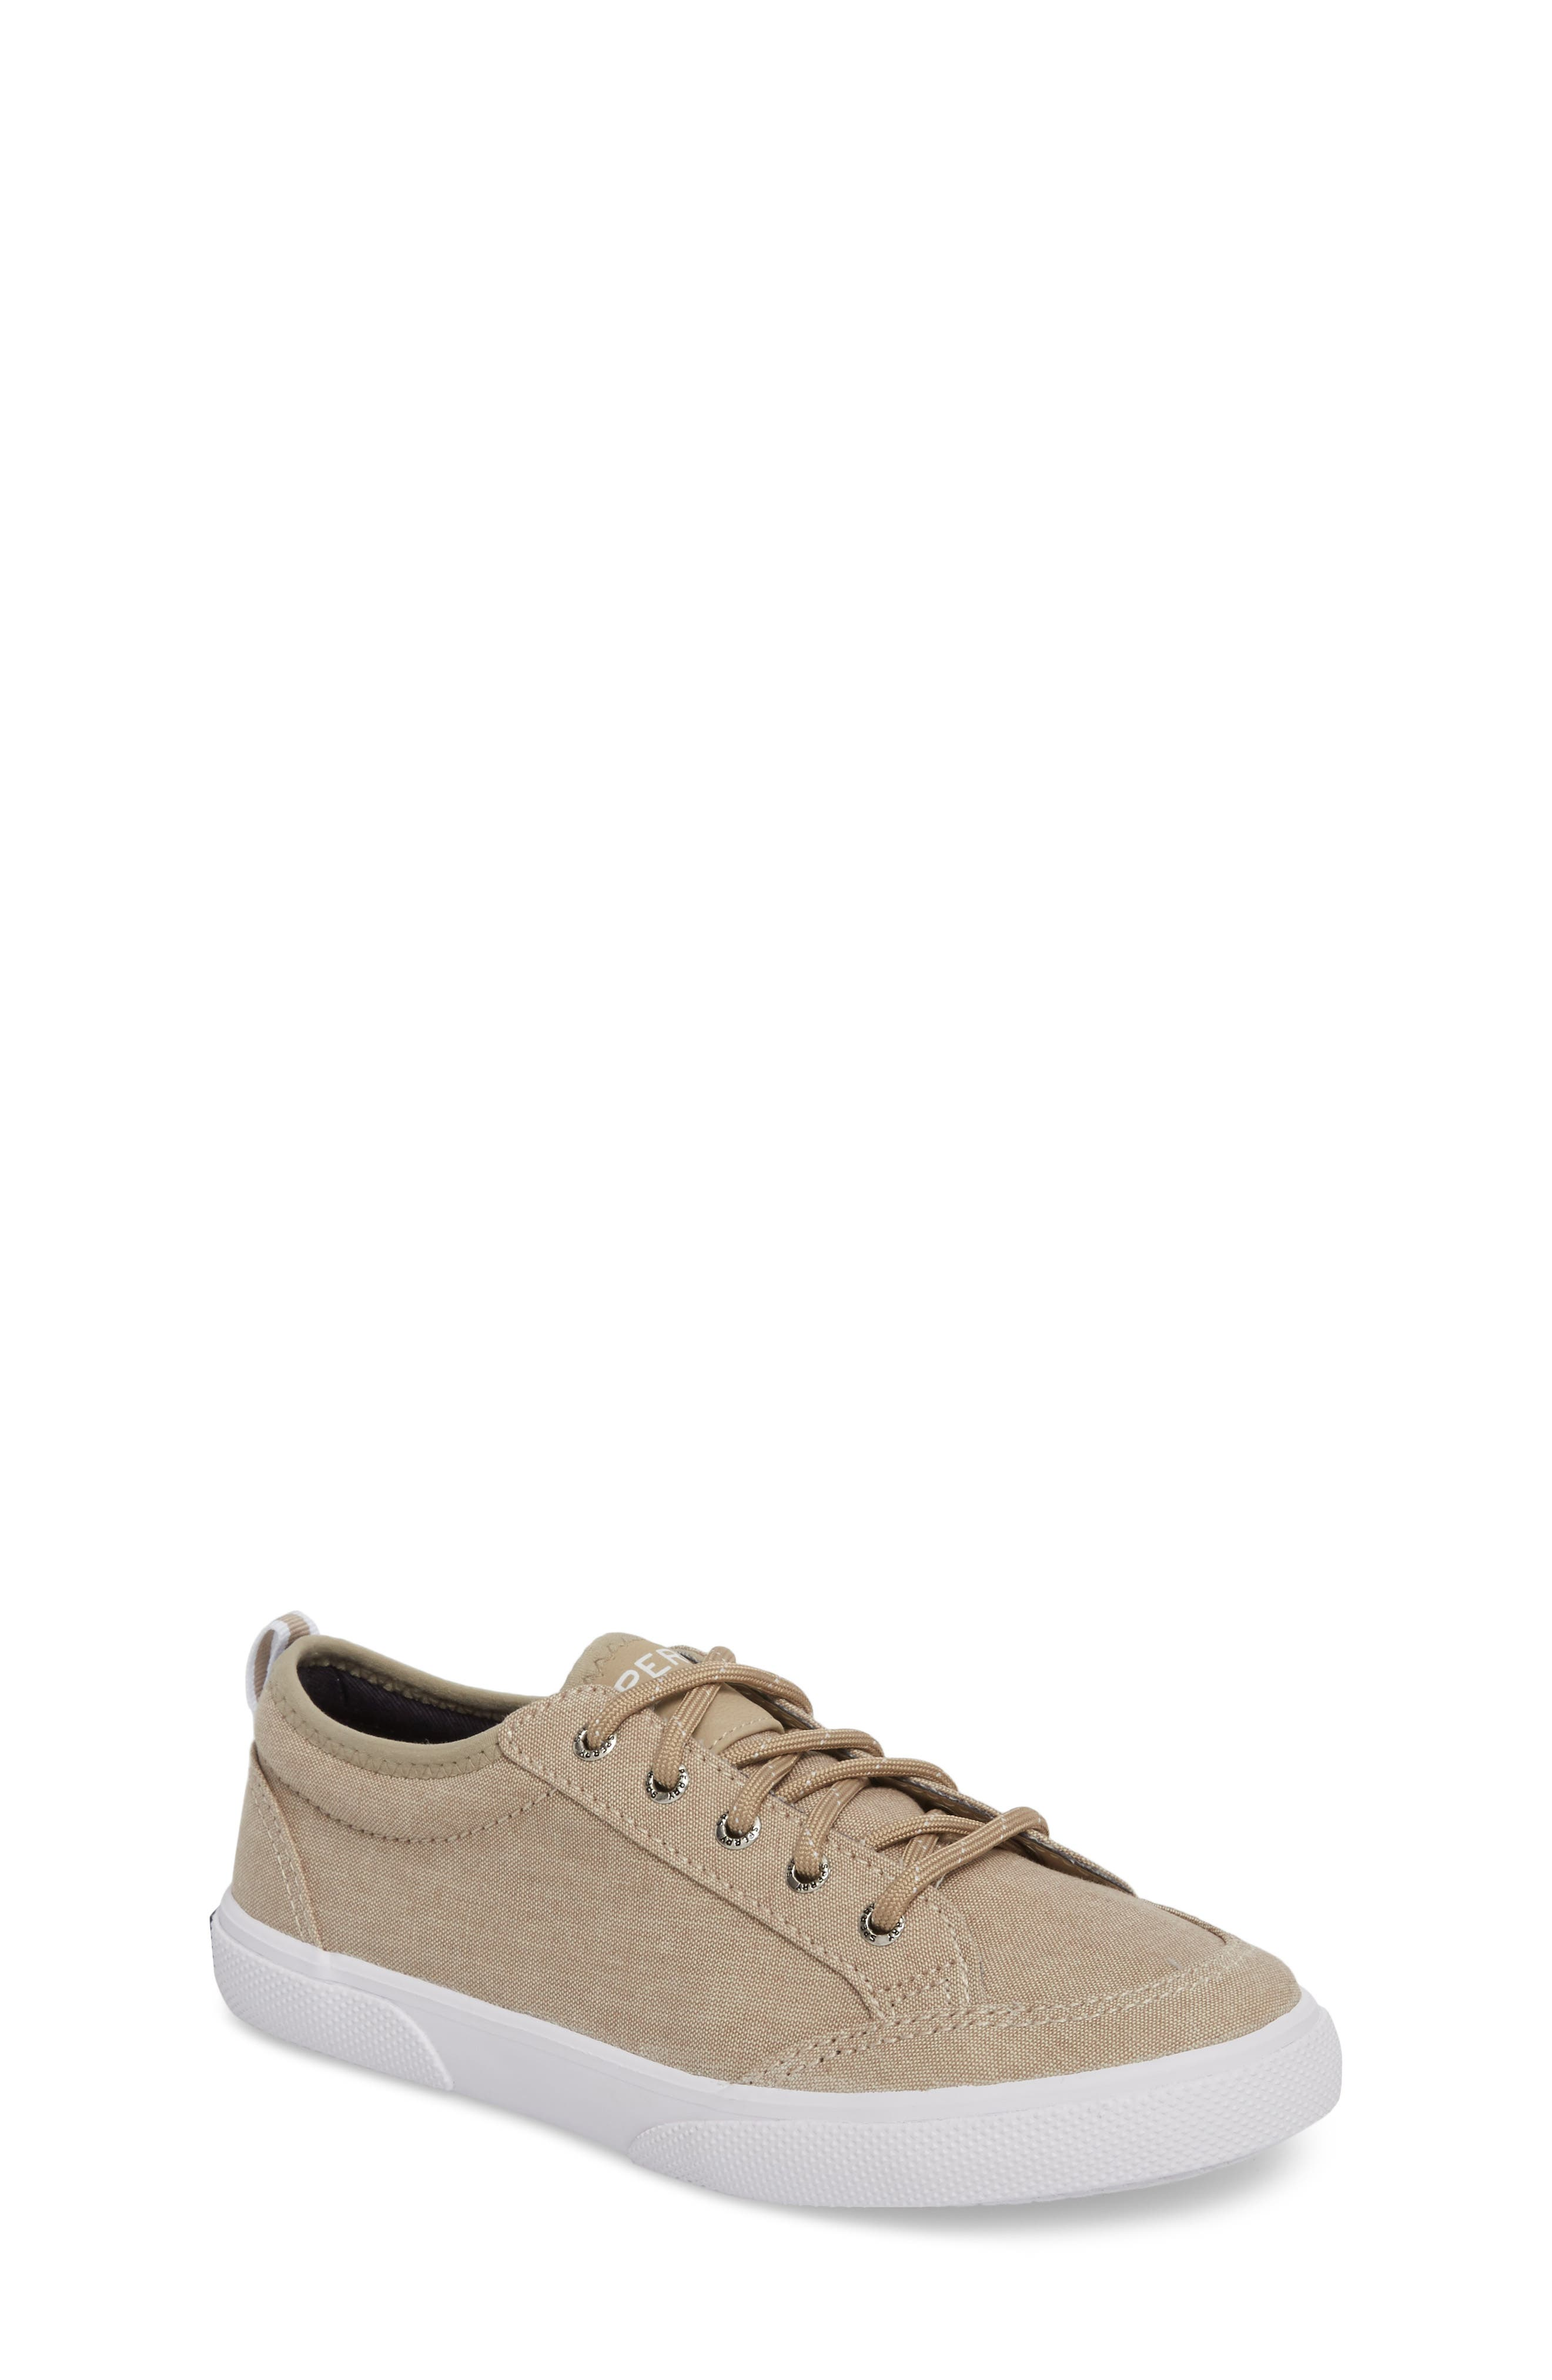 Deckfin Sneaker,                         Main,                         color, Khaki